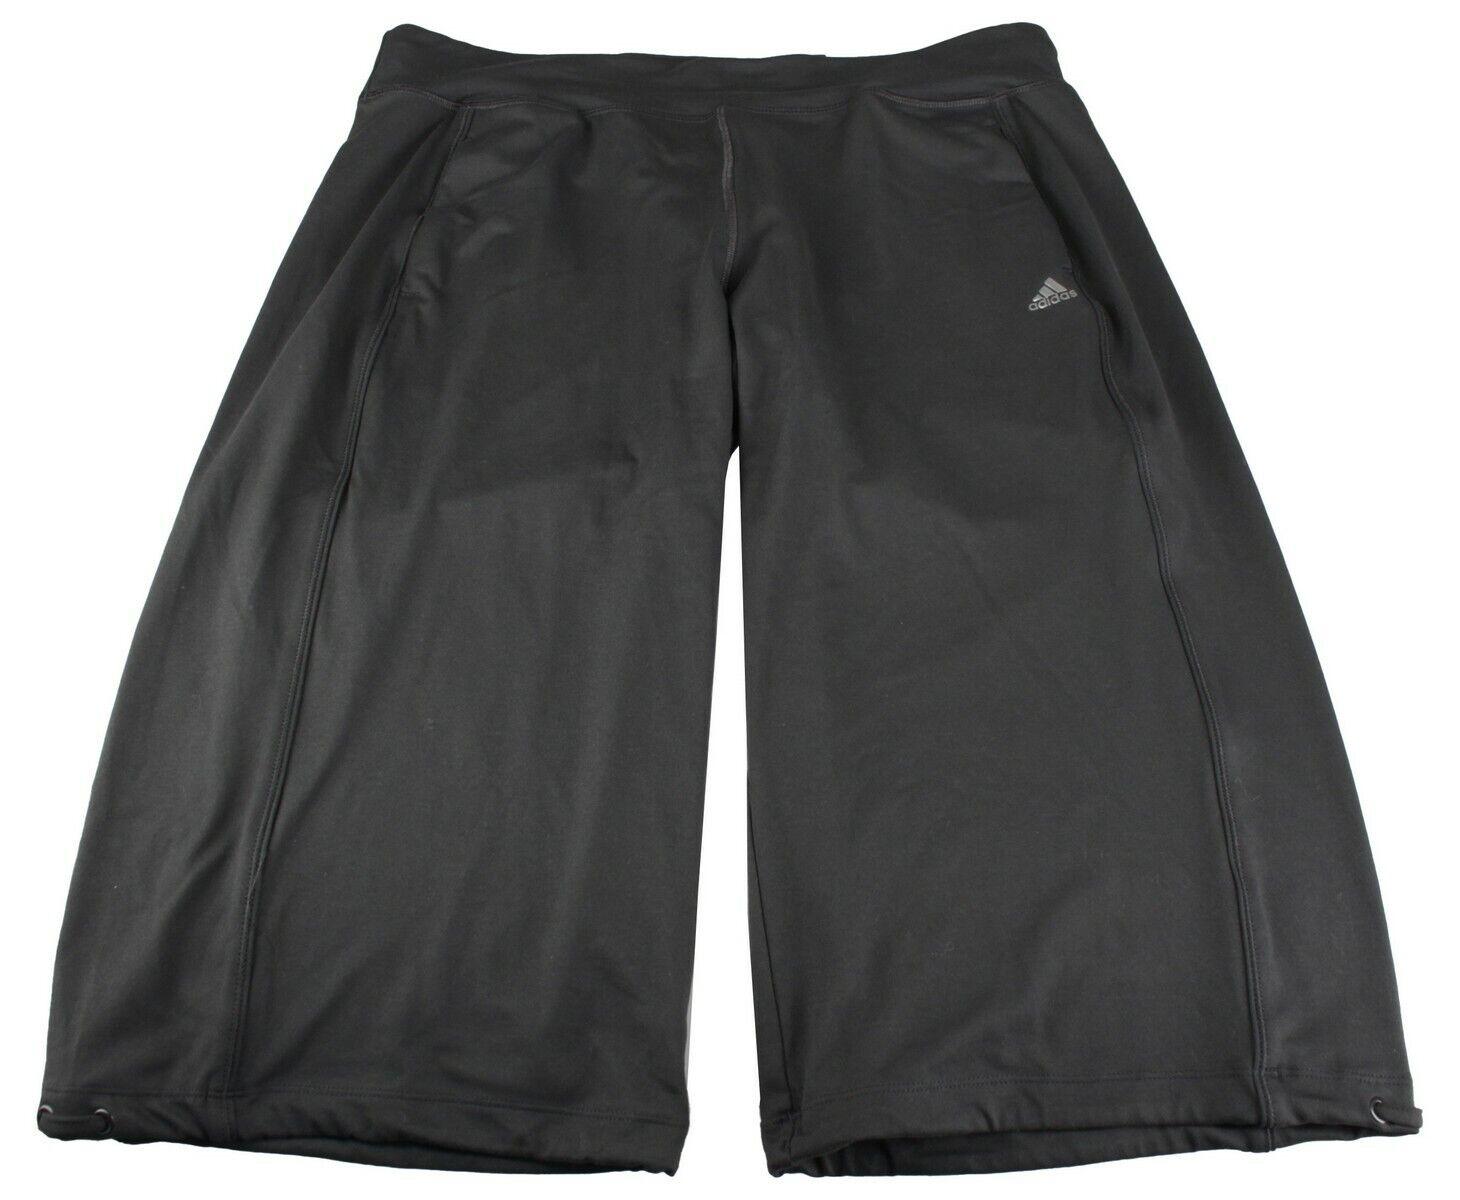 Adidas Damen Shorts Gr. L Schwarz Neu